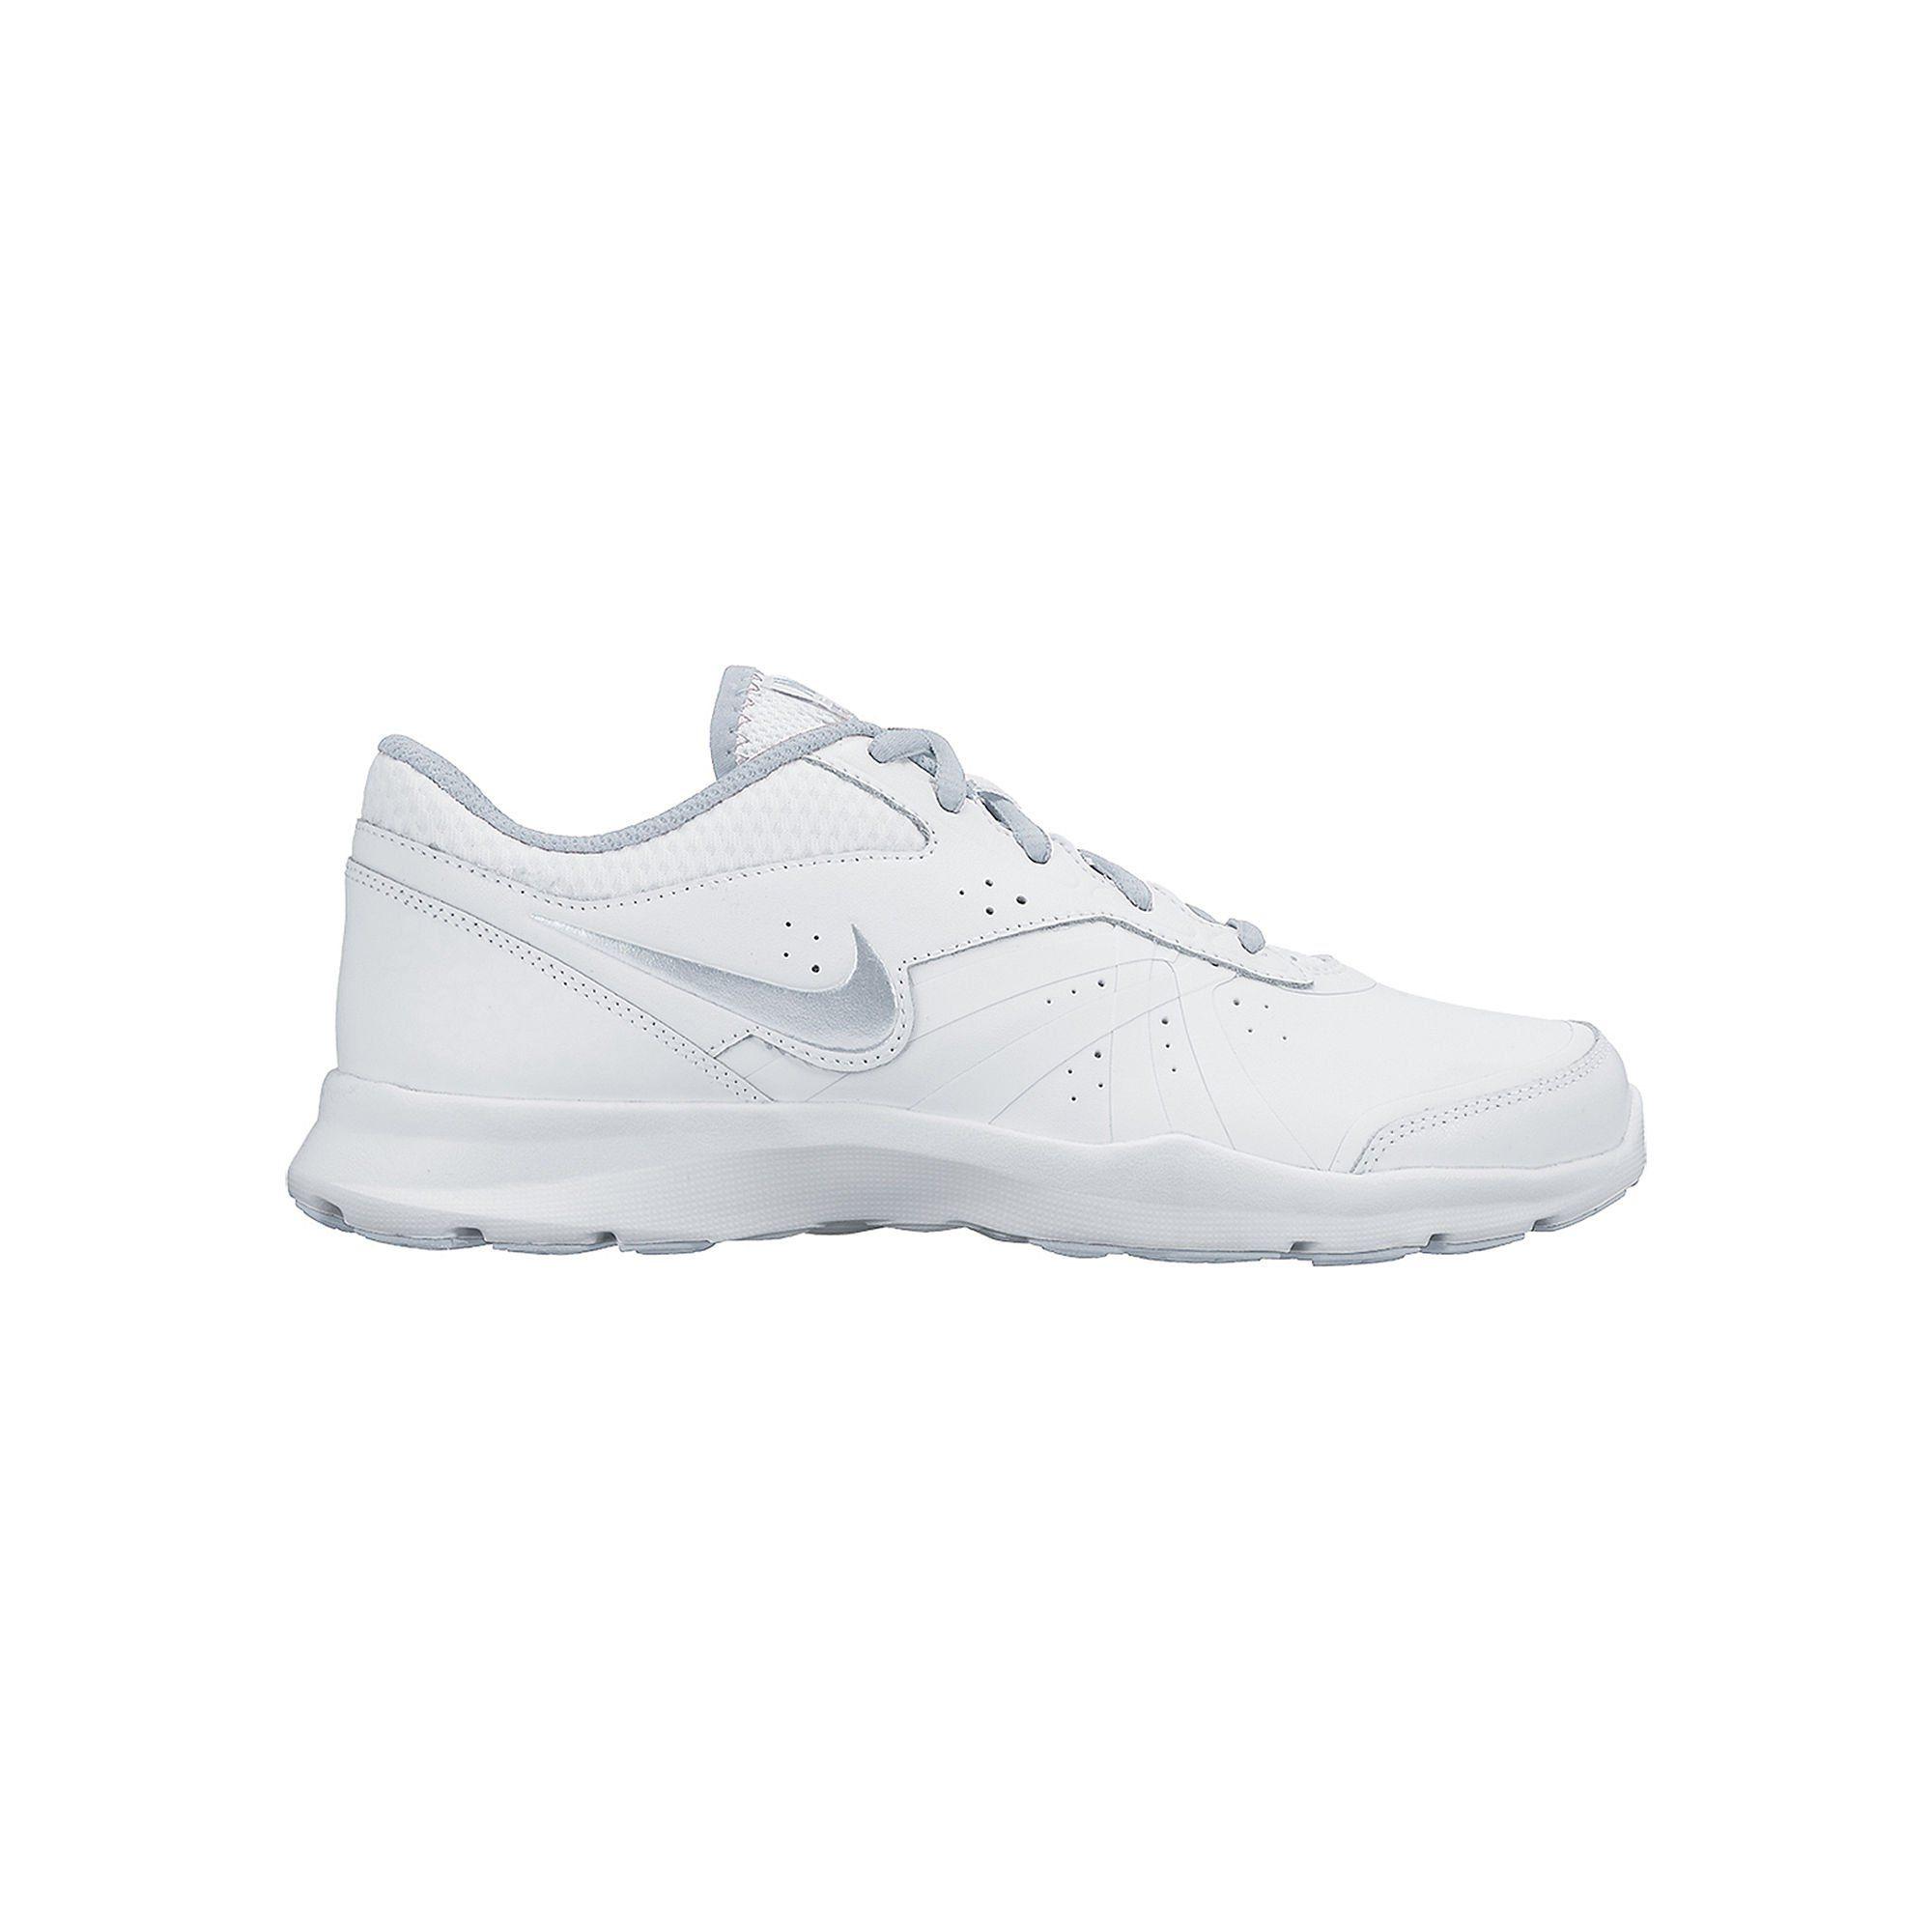 e2ec9d4e751c2 NIKE Women s Core Motion TR 2 Cross Training Shoe